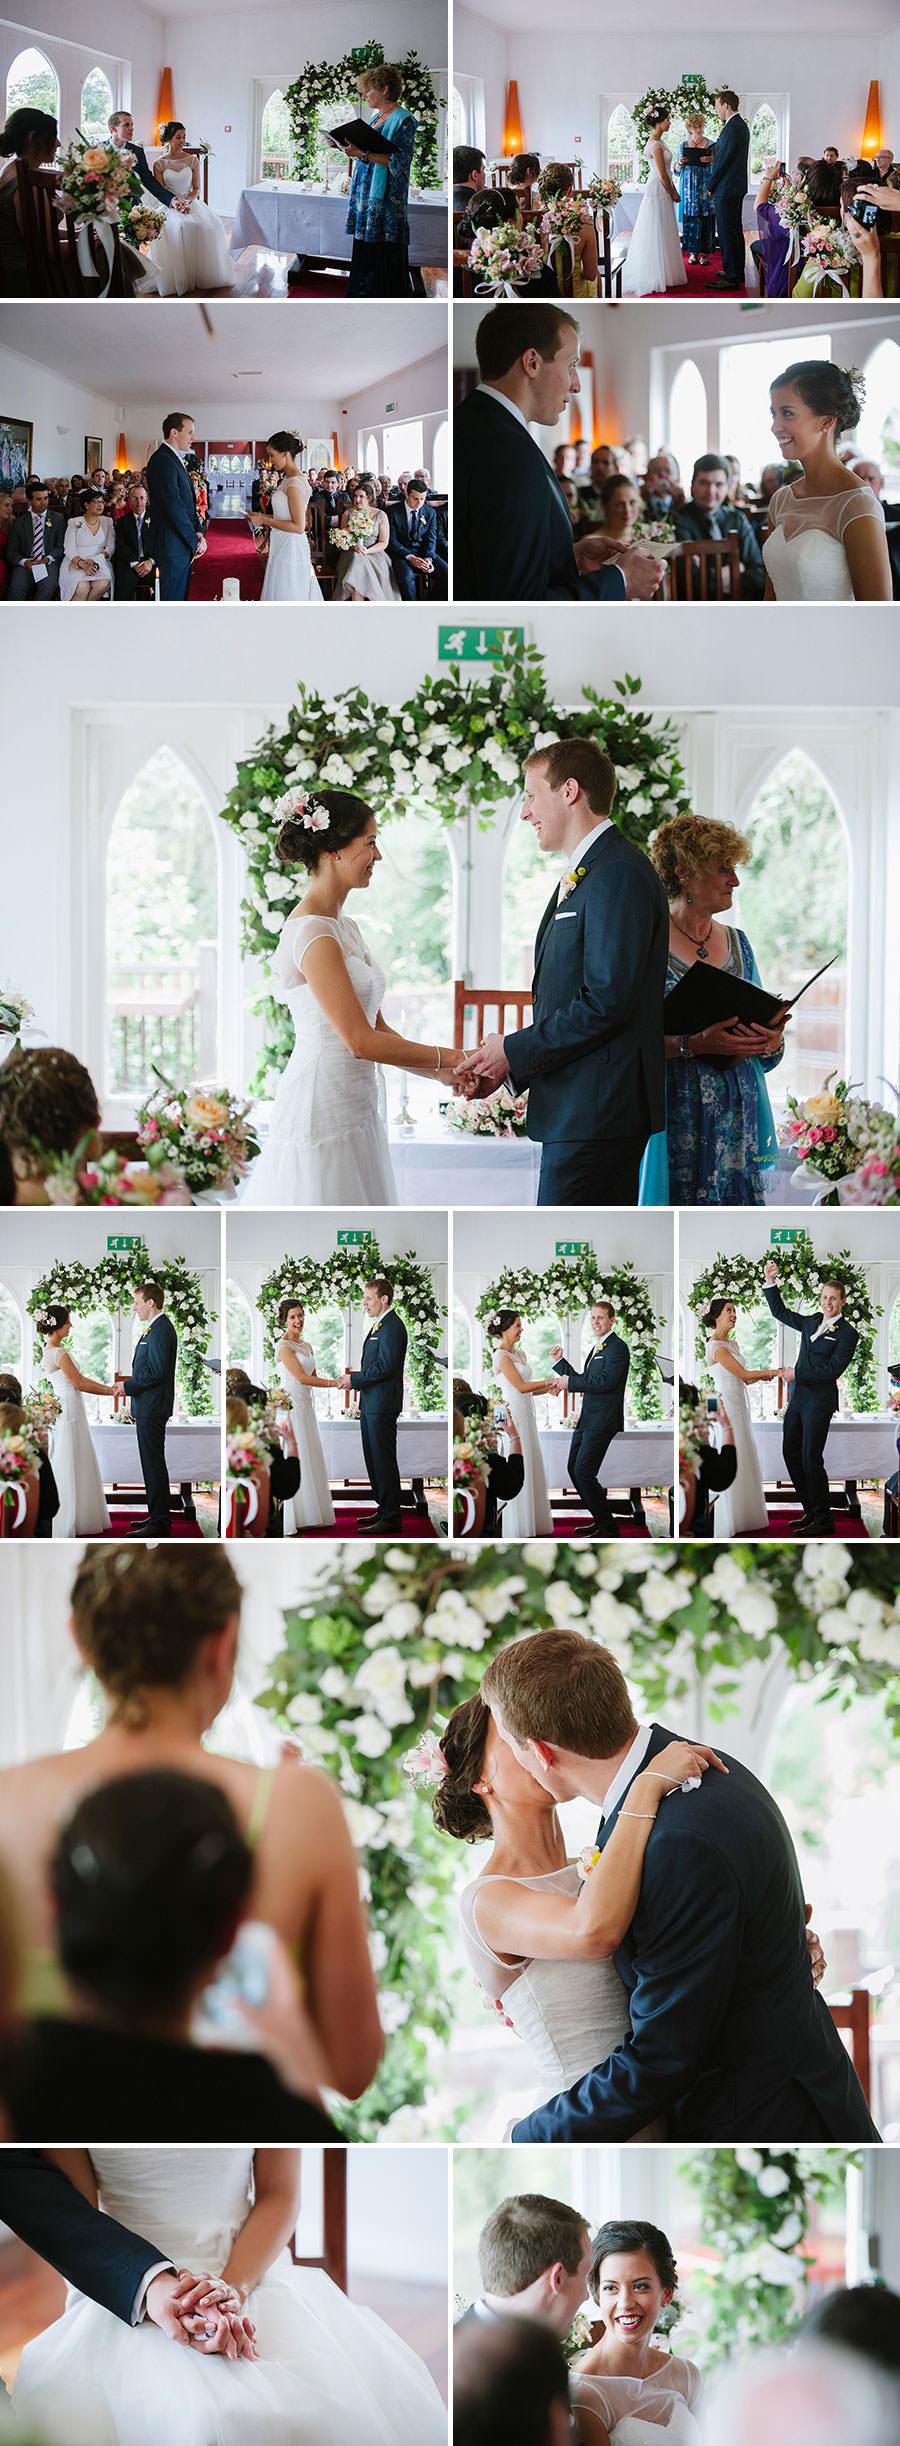 P + R | Barnabrow Country House Wedding | Irish - Australian Wedding | Cork Wedding Photography 46